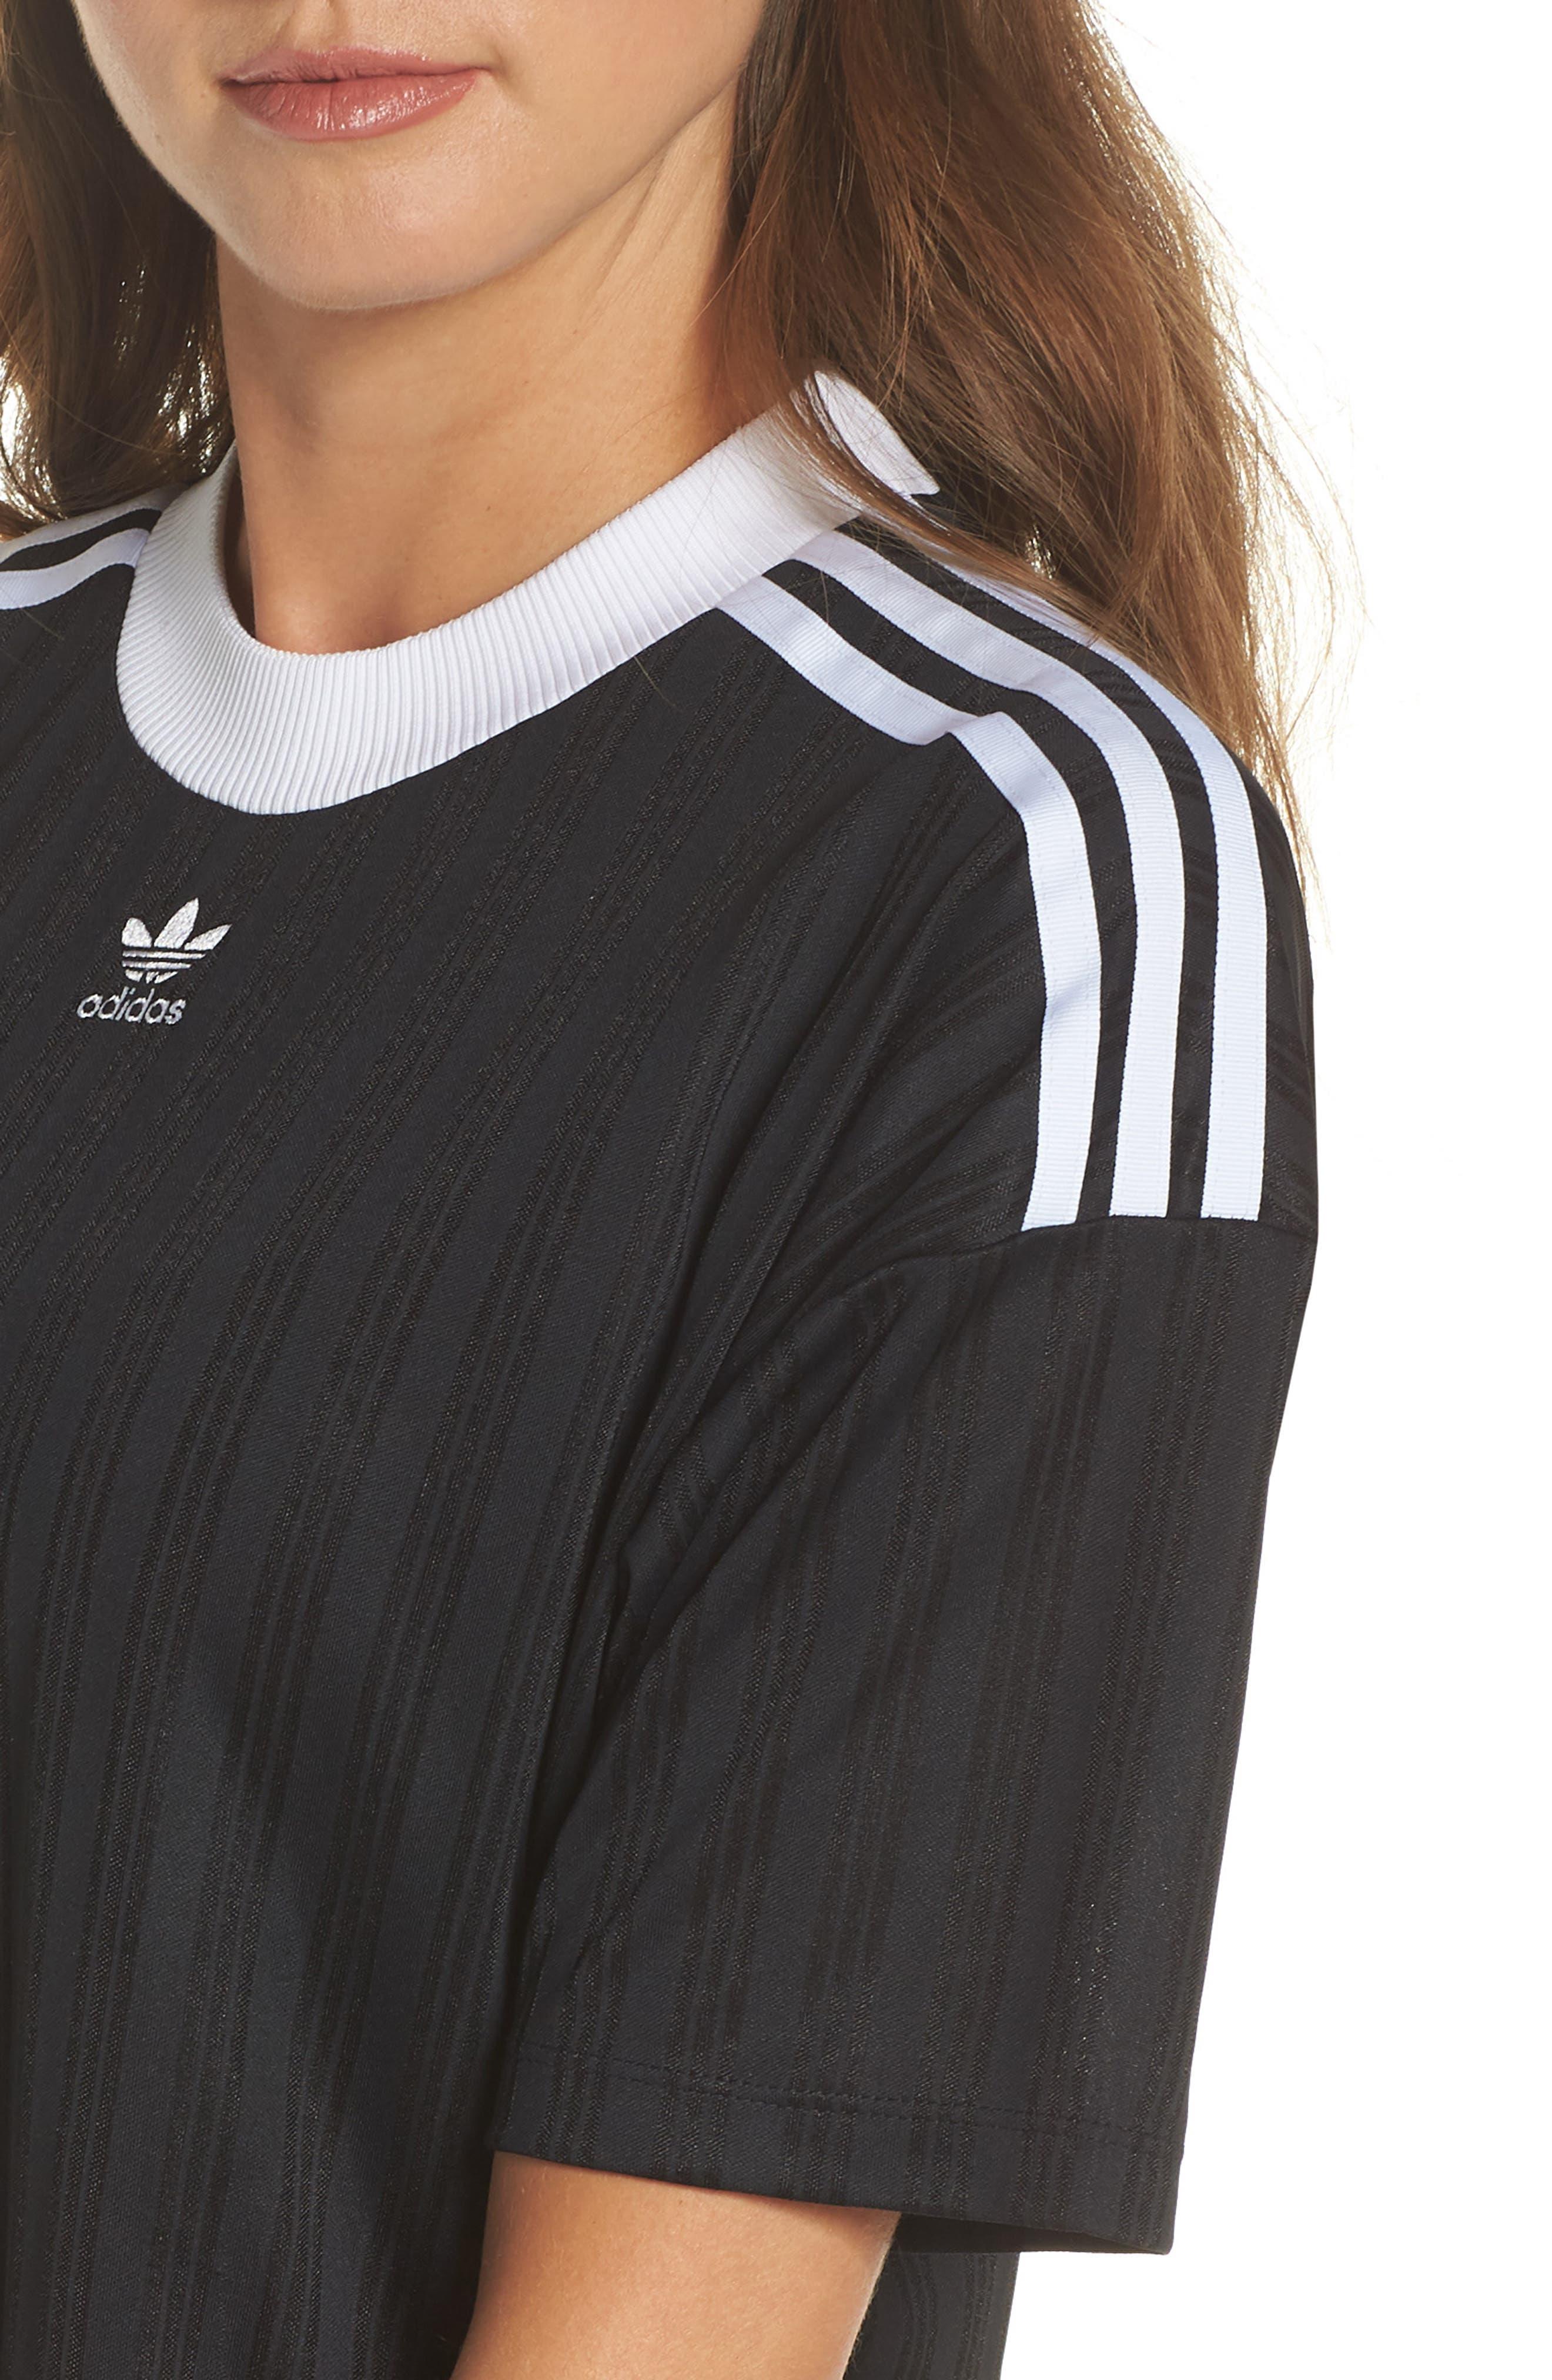 ADIDAS ORIGINALS,                             Trefoil T-Shirt Dress,                             Alternate thumbnail 4, color,                             001